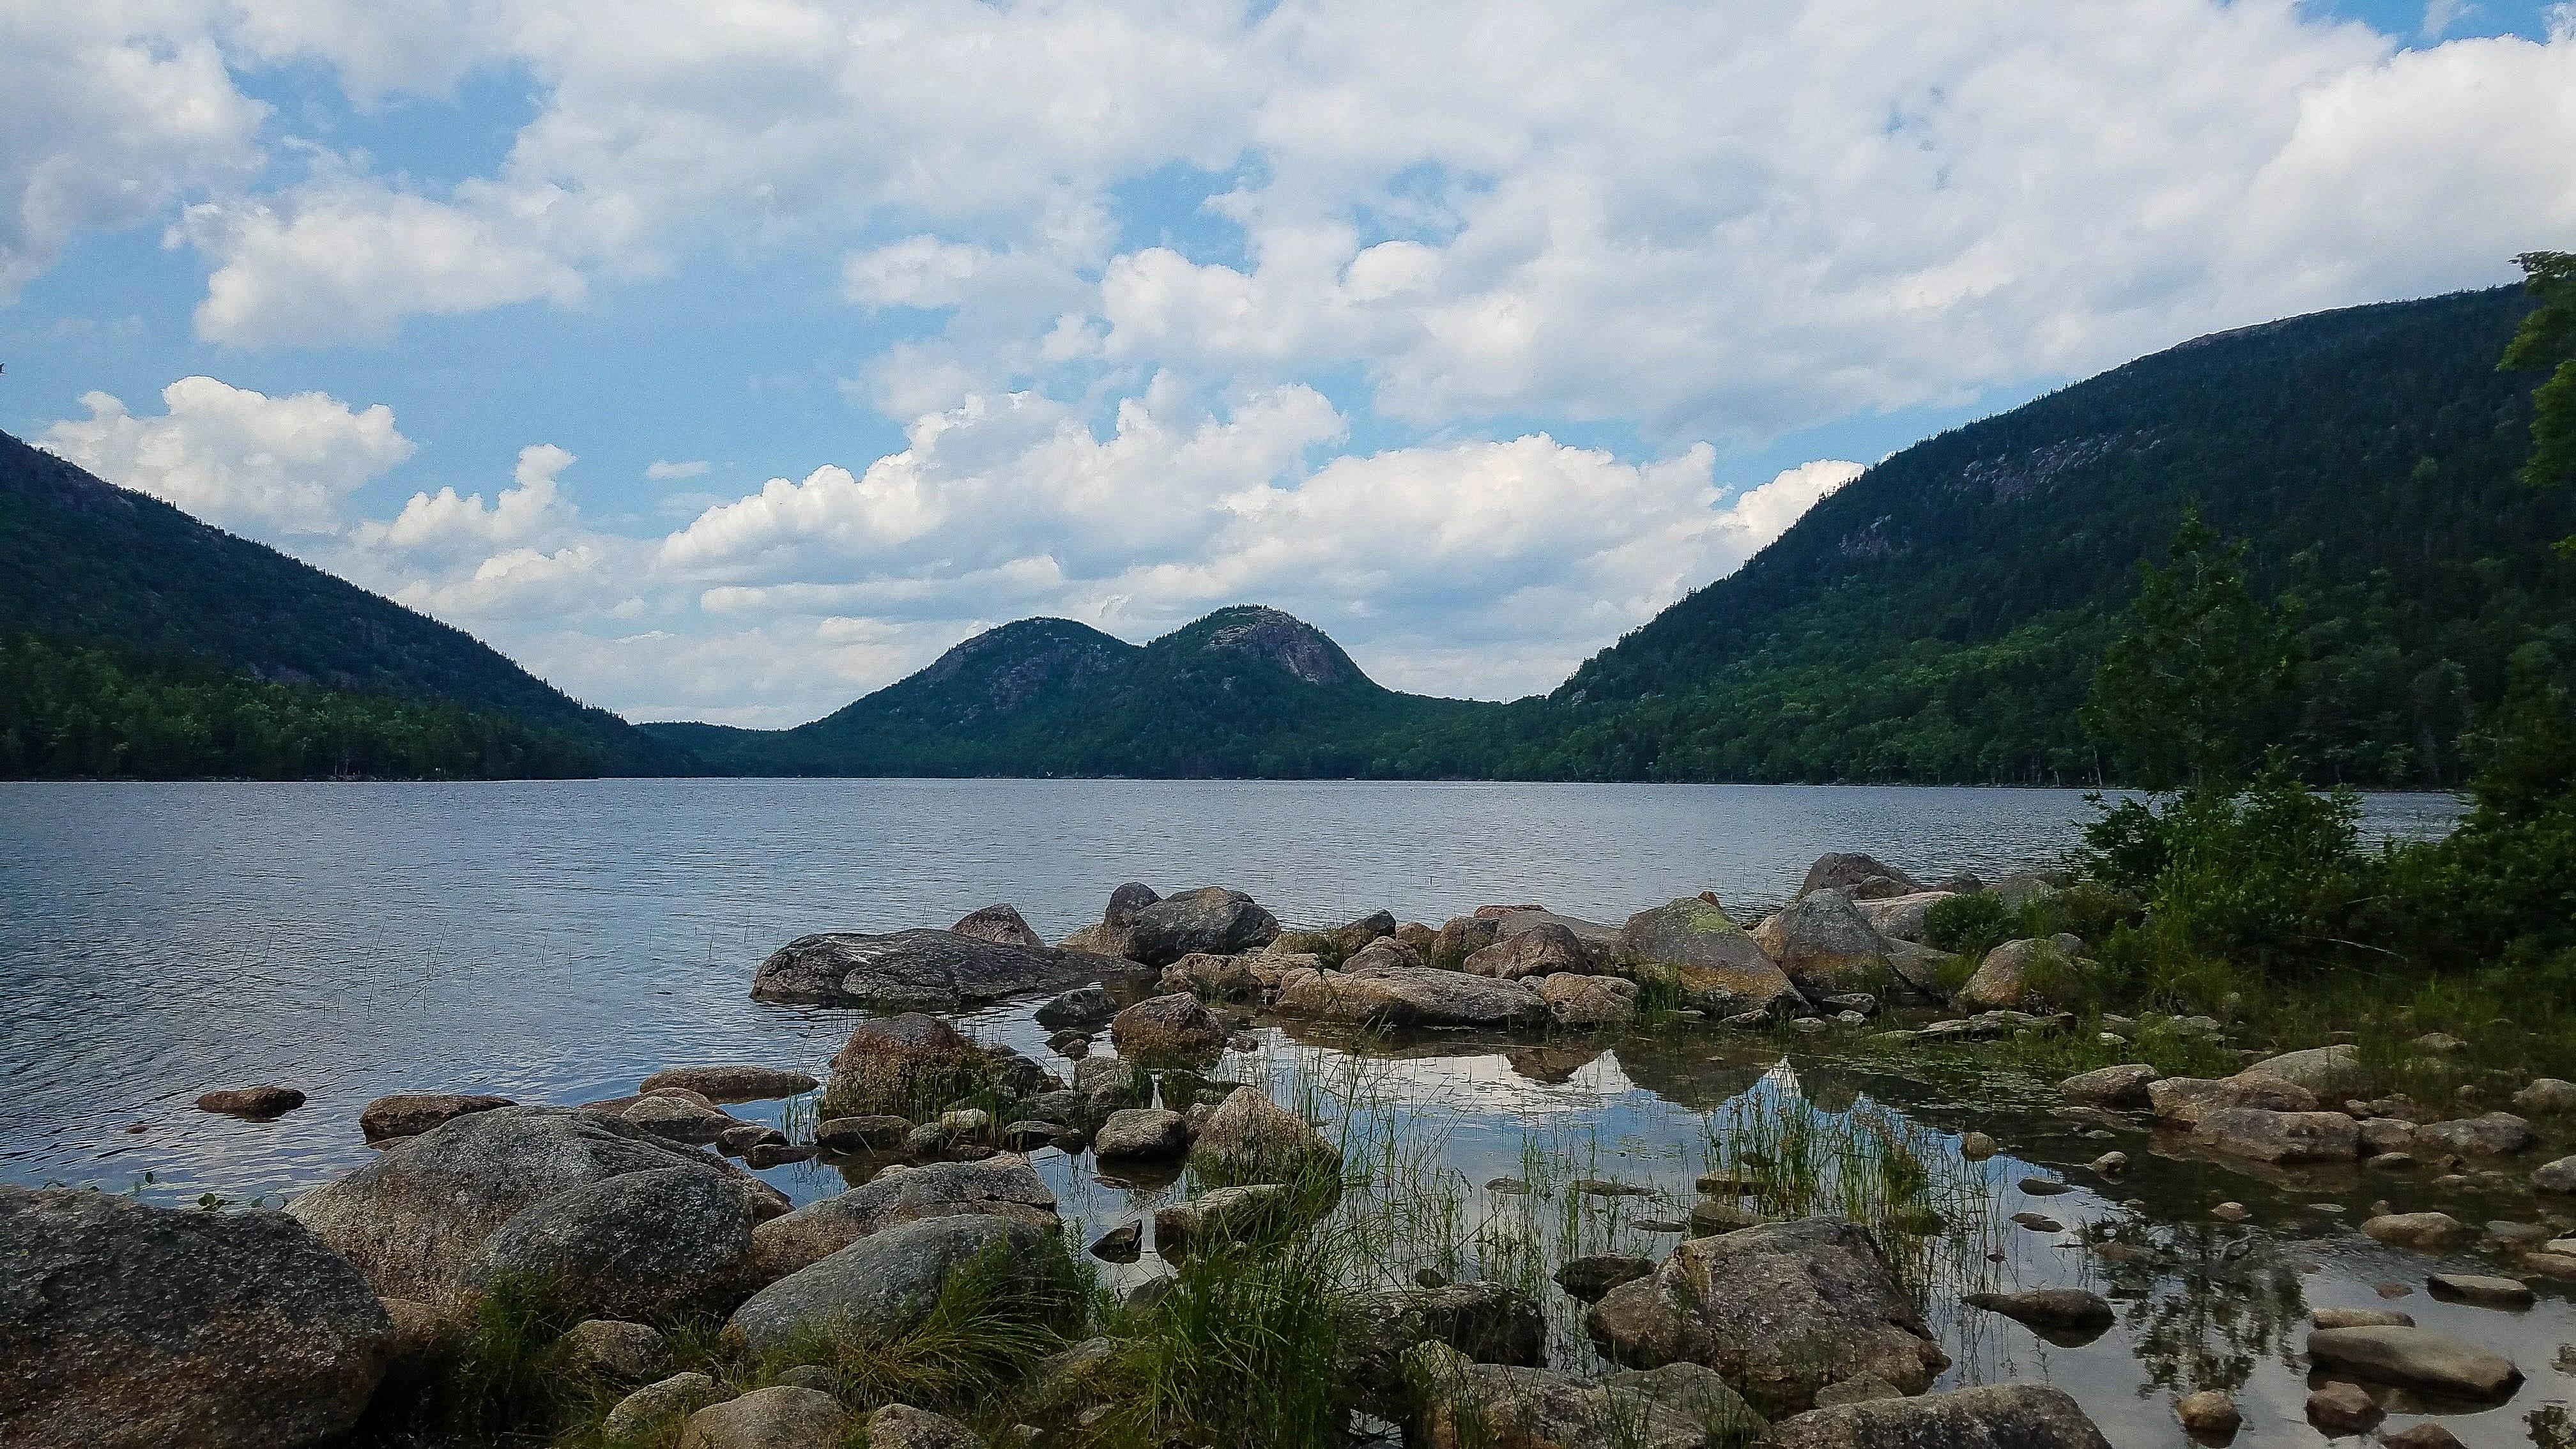 Beginner's Guide to Jordan Pond in Acadia National Park